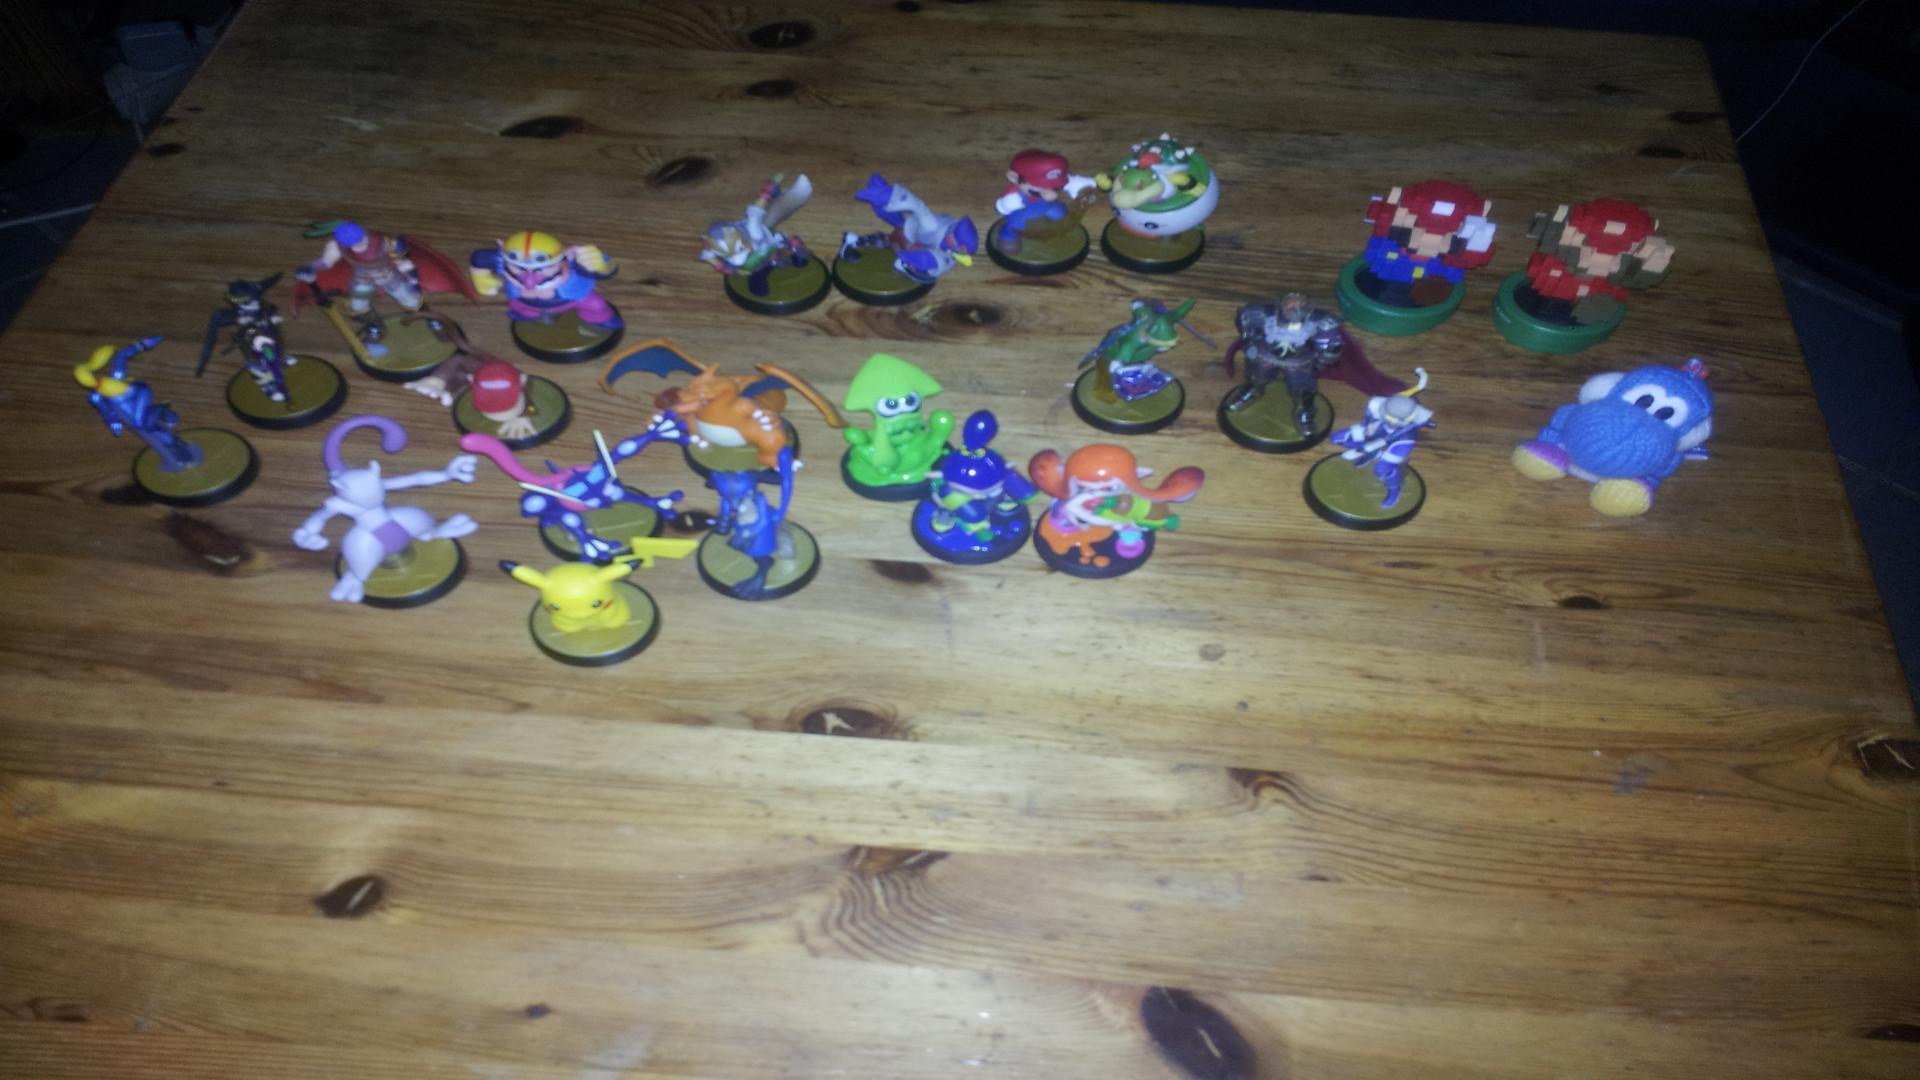 nat games amiibo sammlung maarten